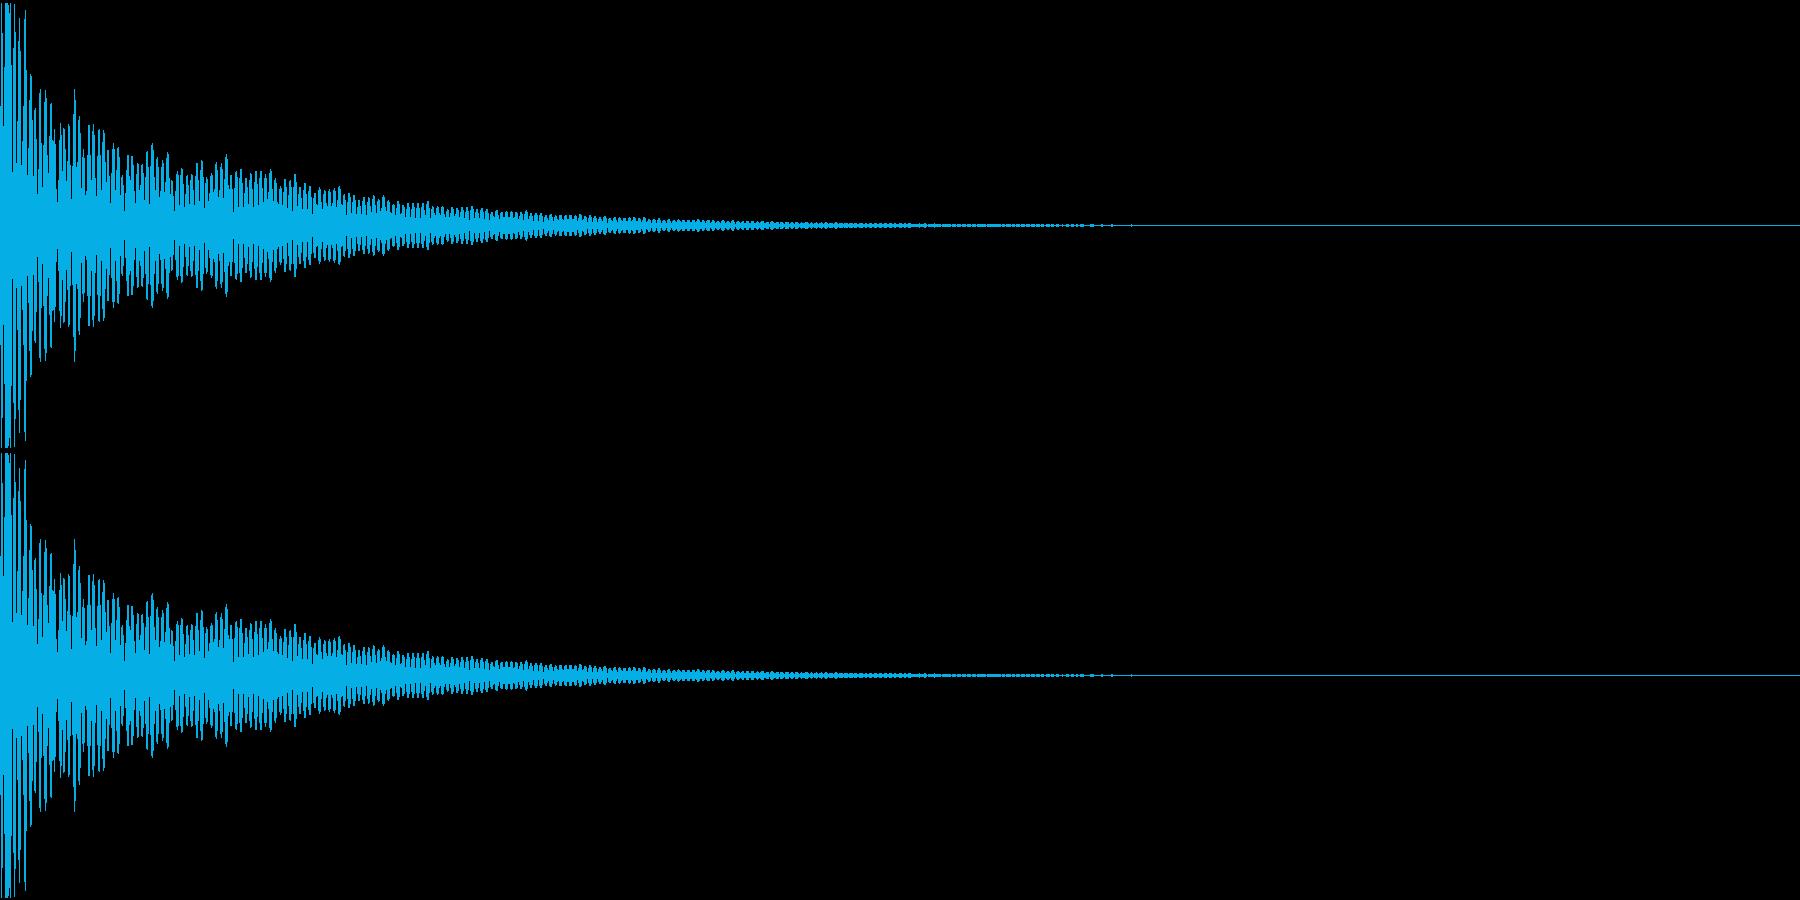 DTM Tom 23 オリジナル音源の再生済みの波形